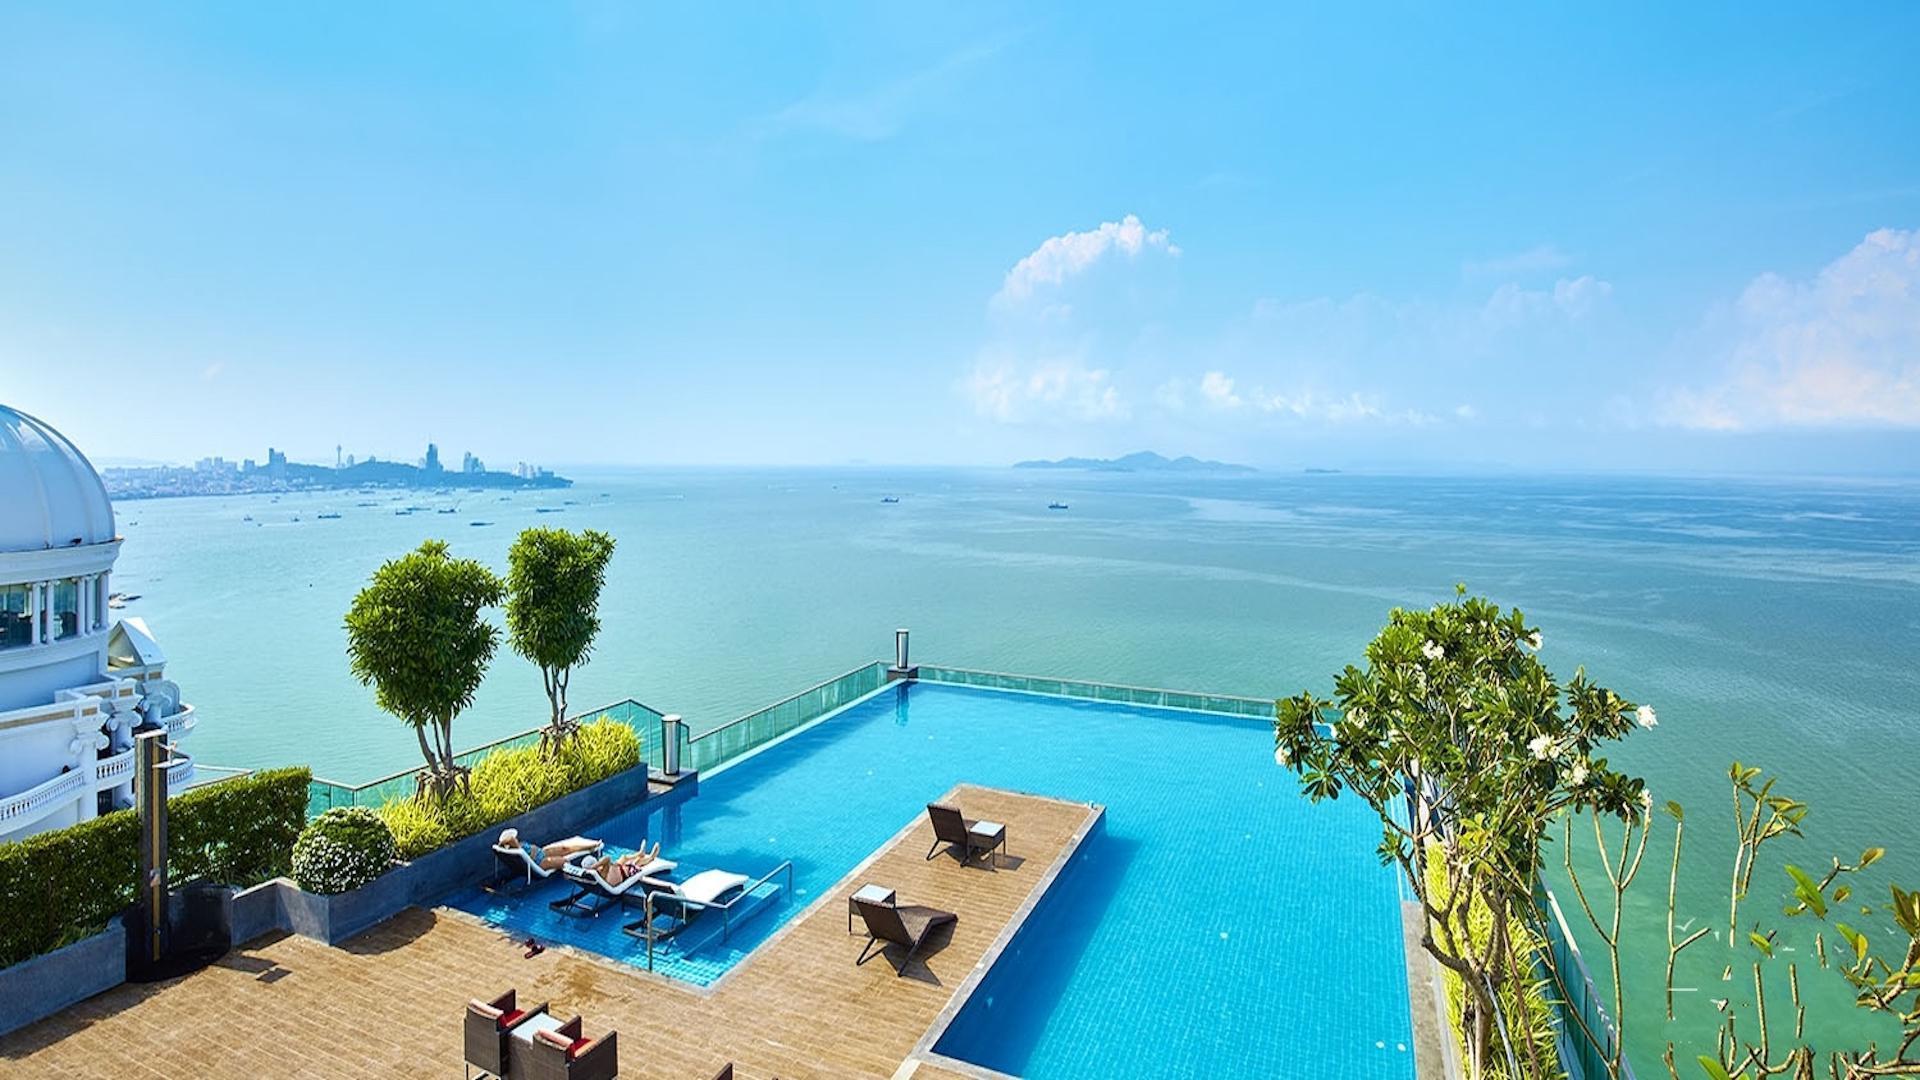 Wong Amat Tower Luxury Beachfront Duplex Apt อพาร์ตเมนต์ 1 ห้องนอน 2 ห้องน้ำส่วนตัว ขนาด 65 ตร.ม. – นาเกลือ/บางละมุง